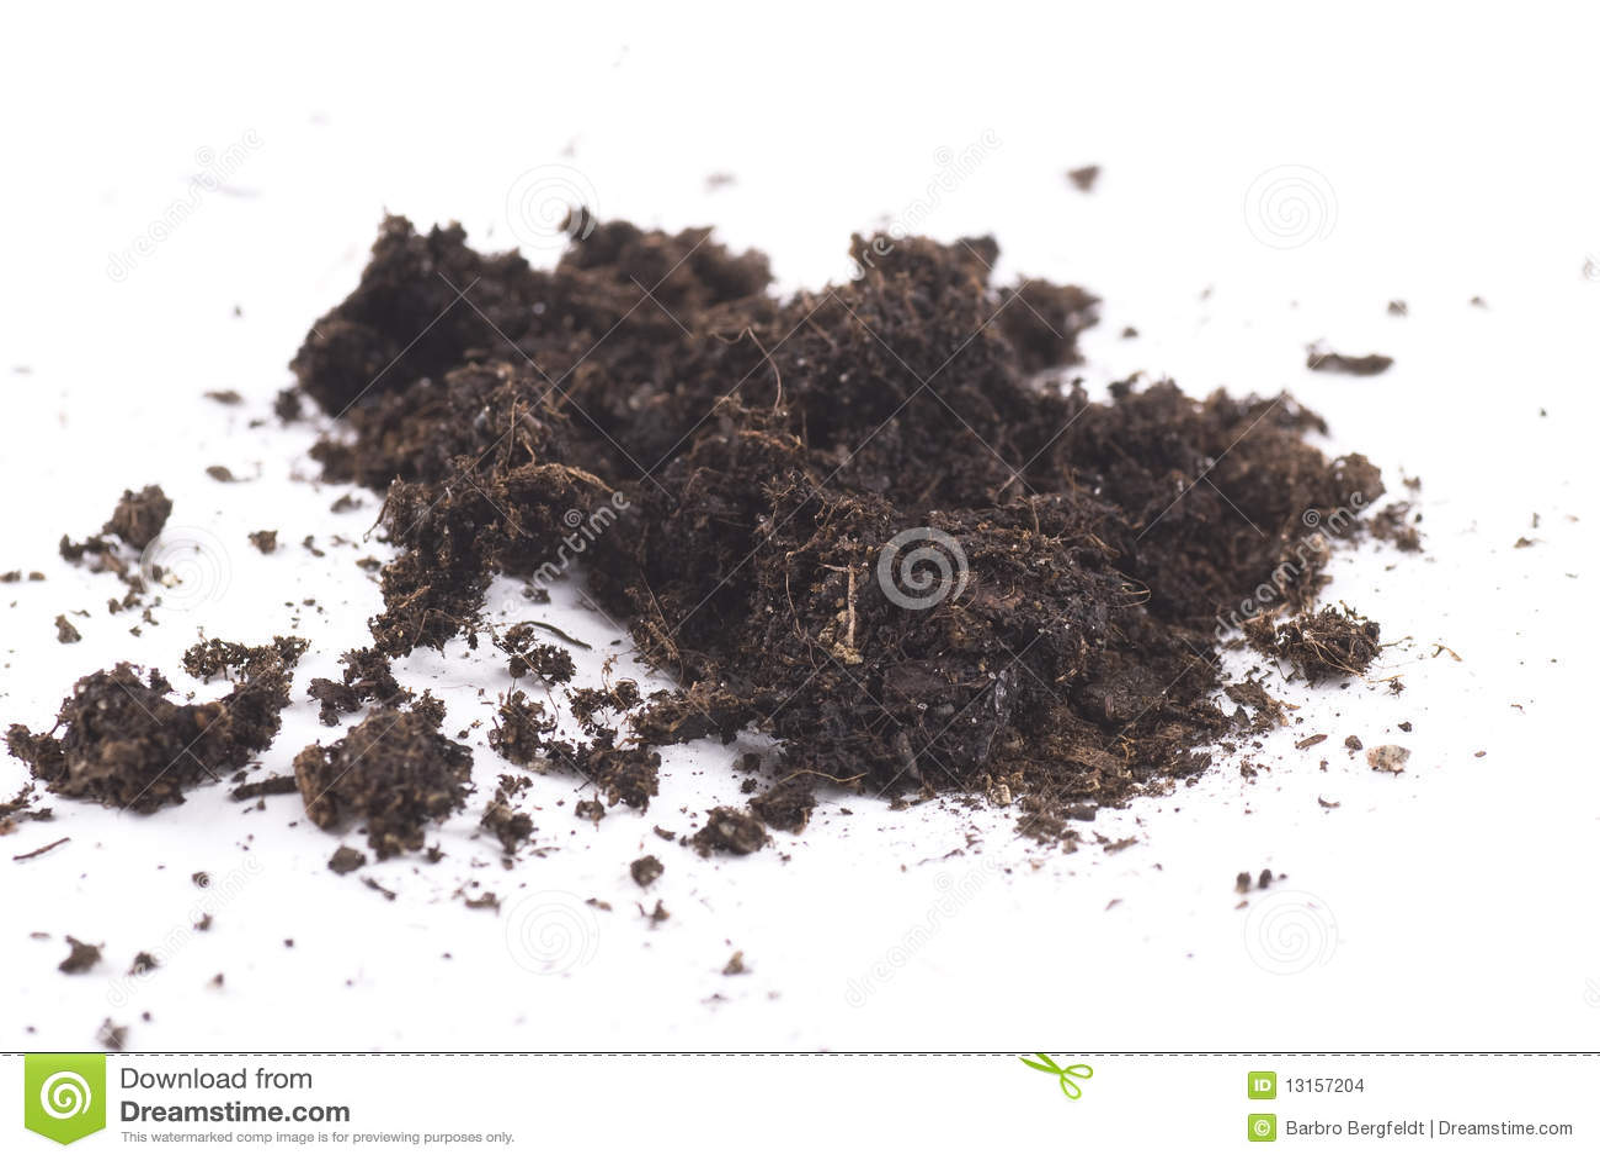 Soil stock images image 13157204 for Organic compost soil